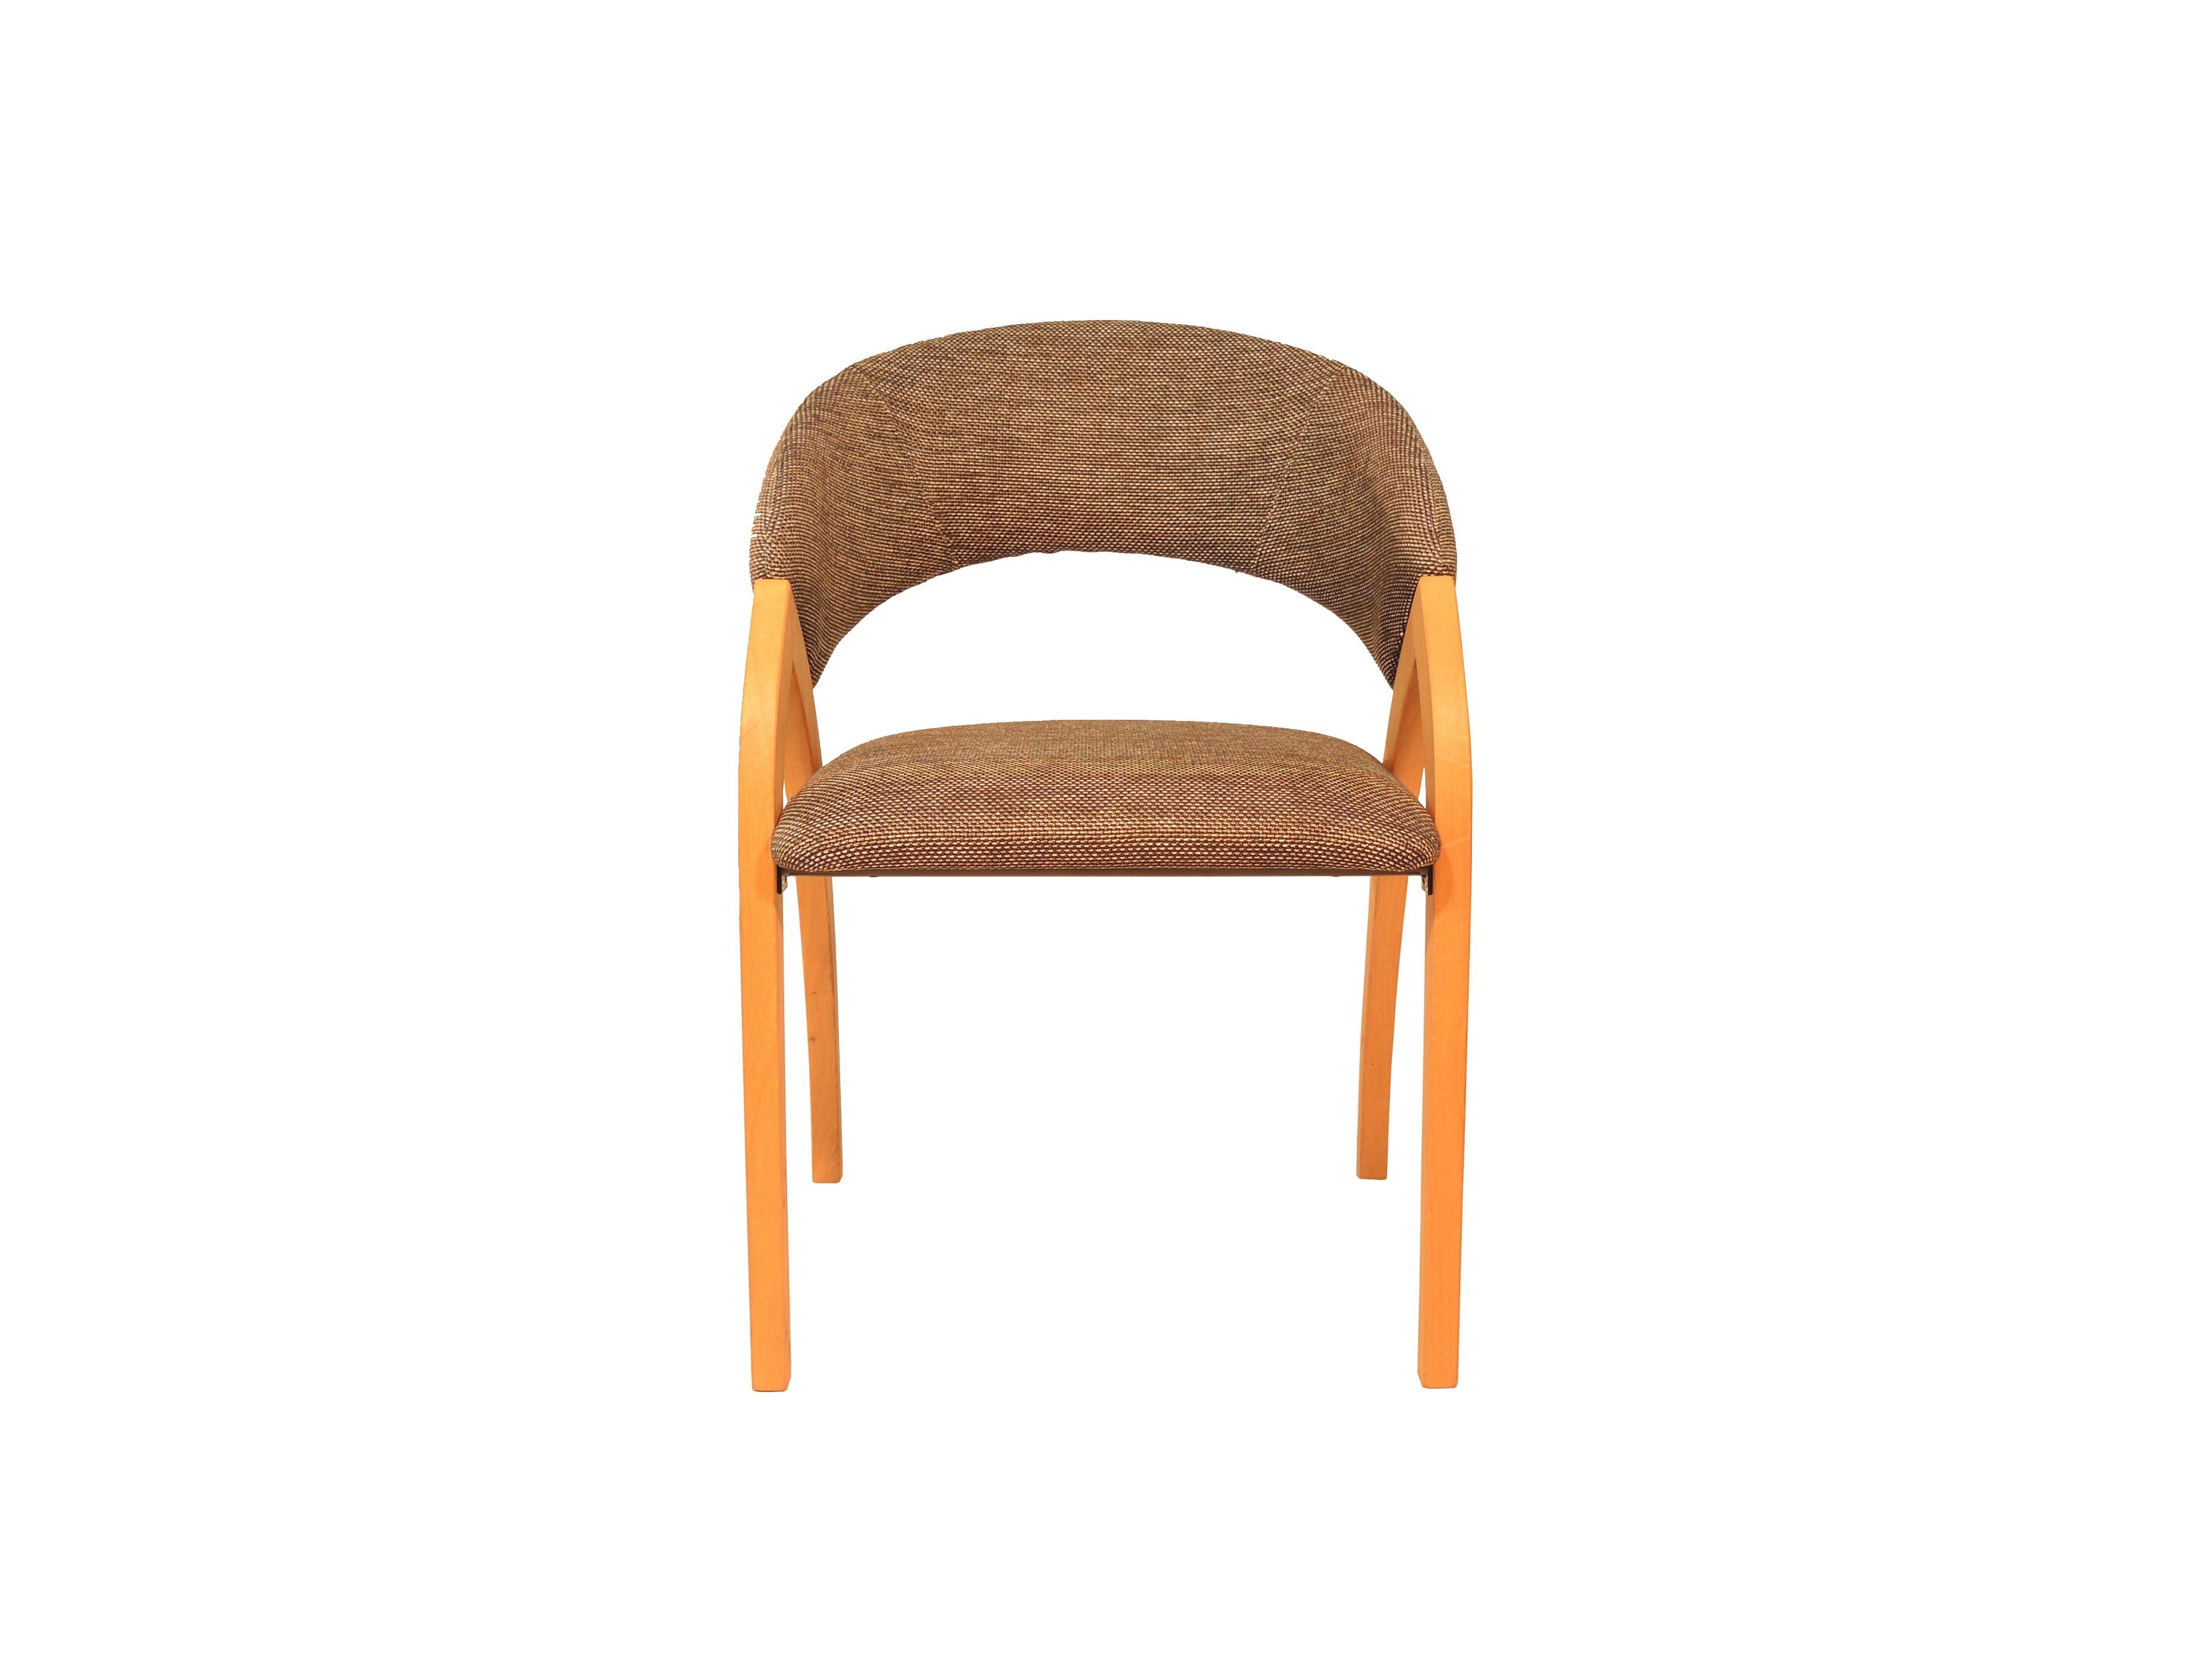 Arturo - Design stoel ontwerp lokaal